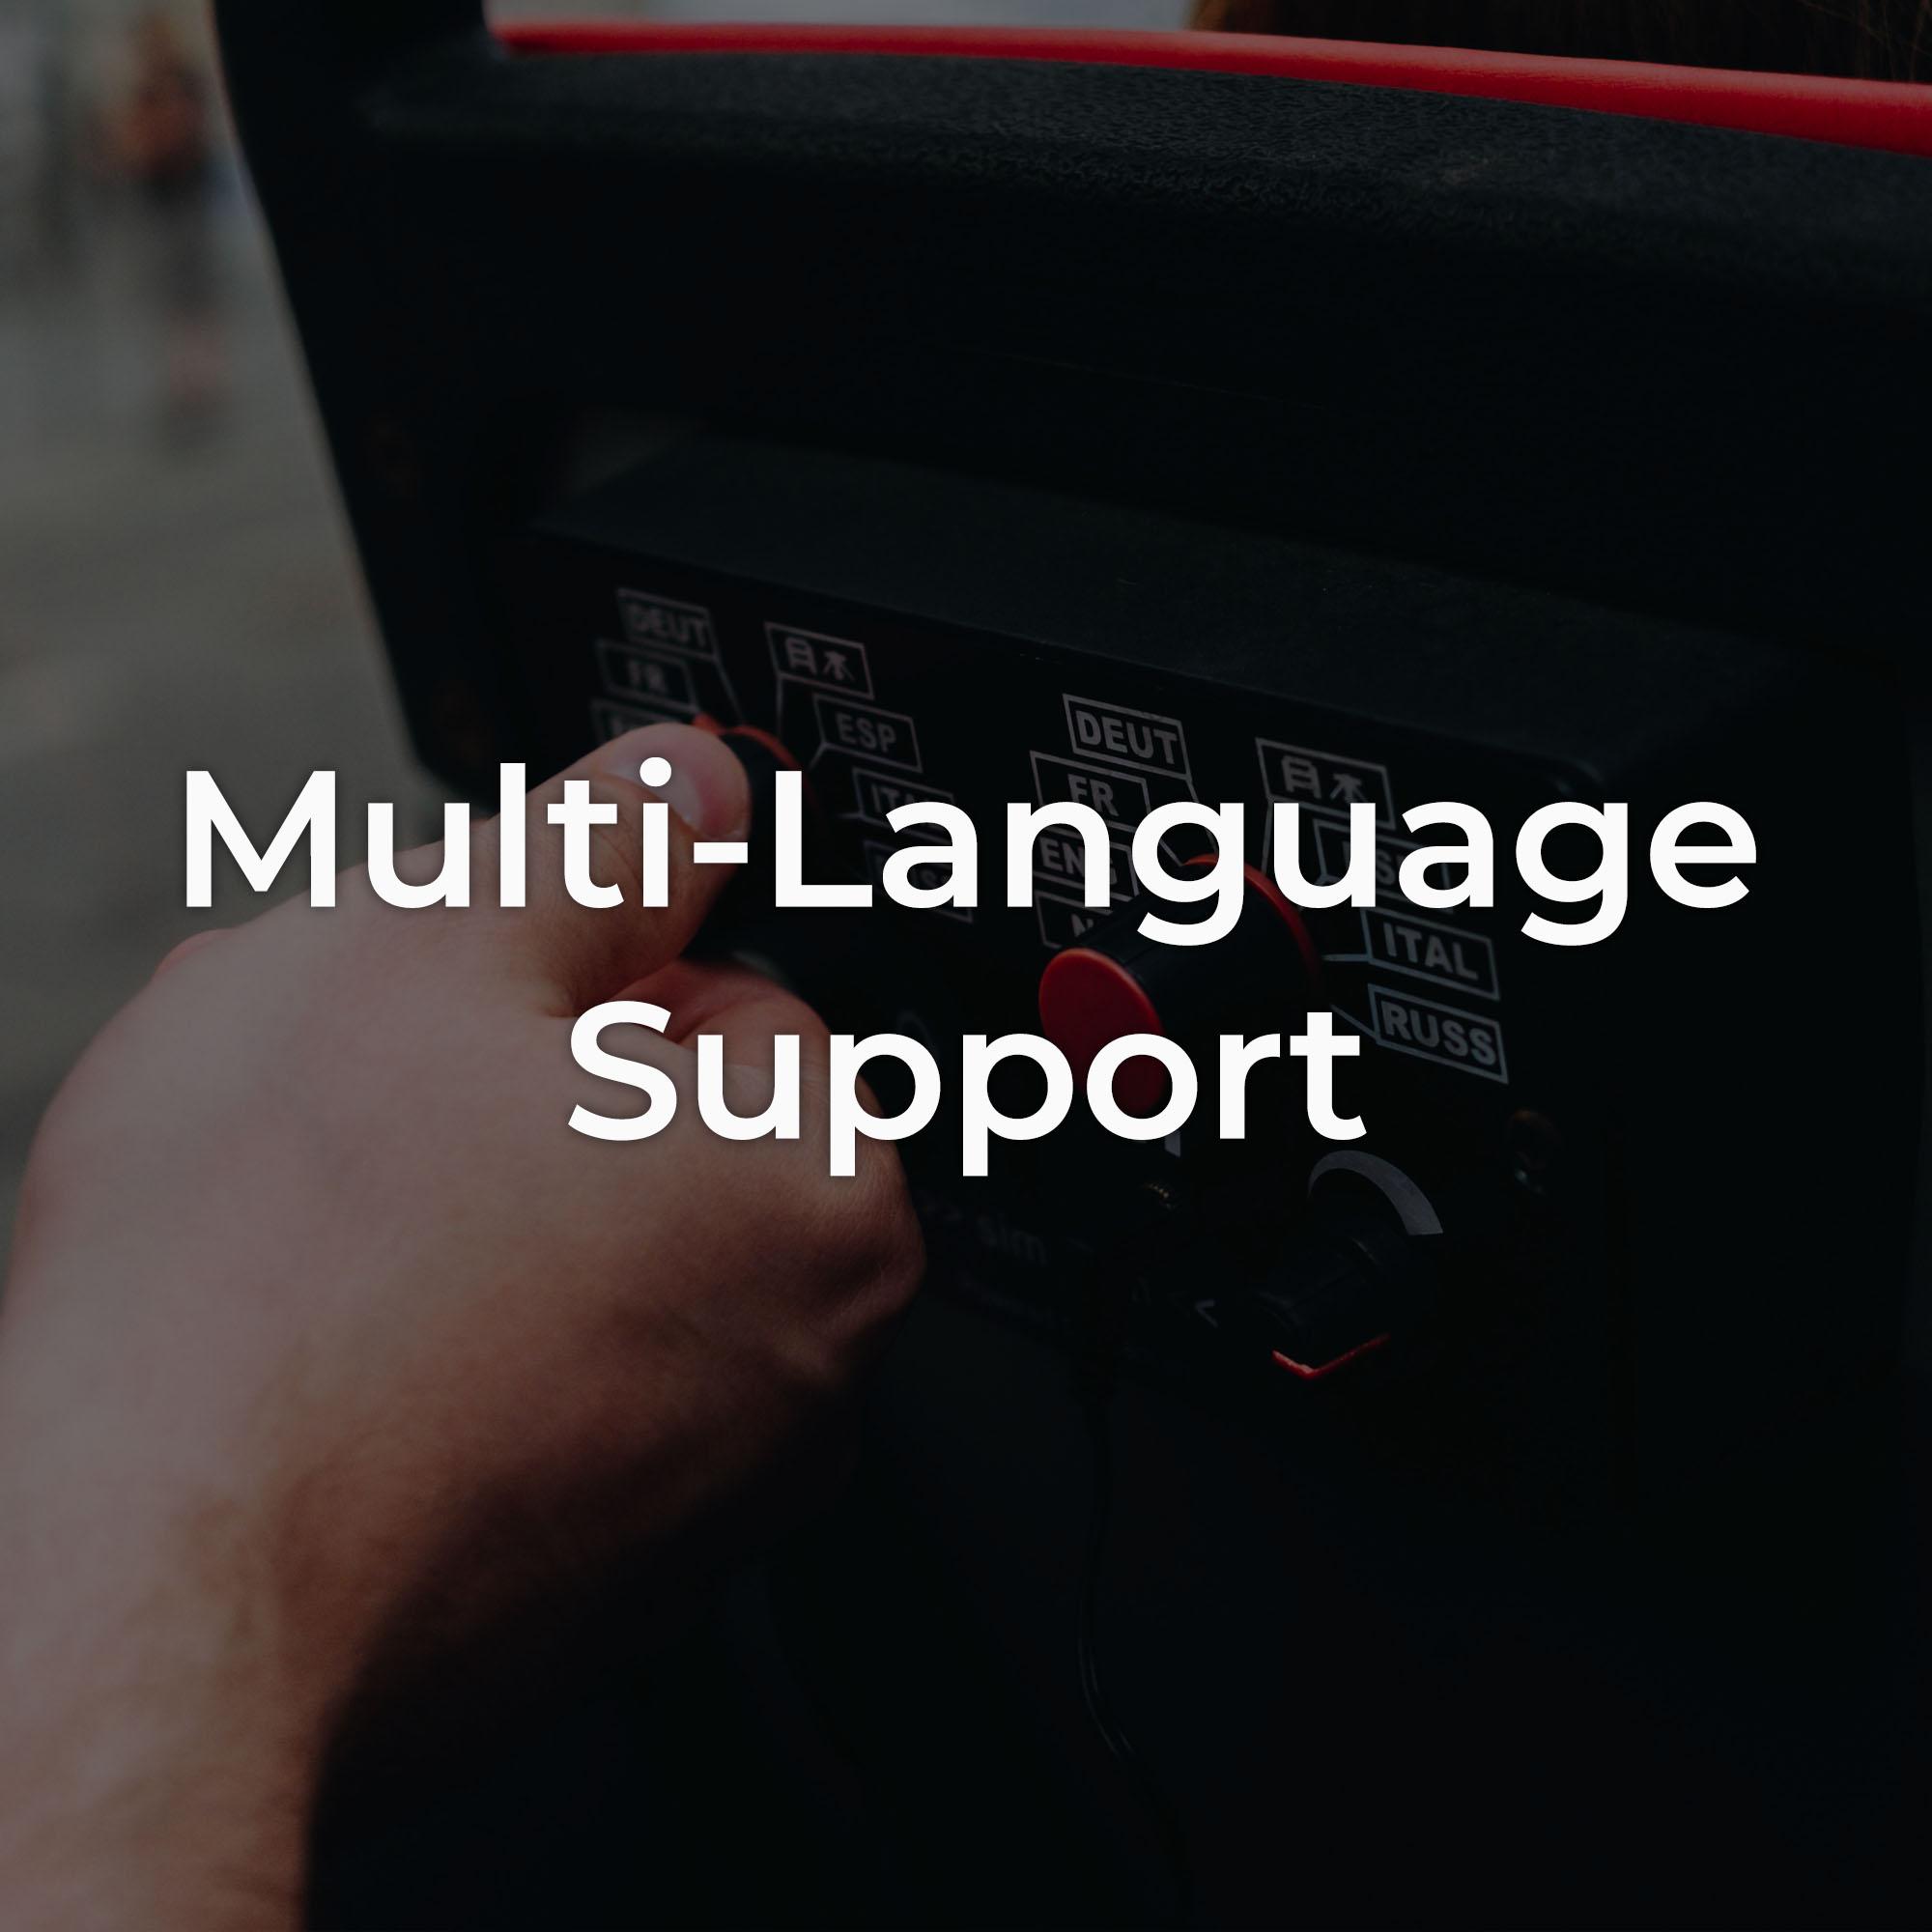 10 Multi-Language Support.jpg